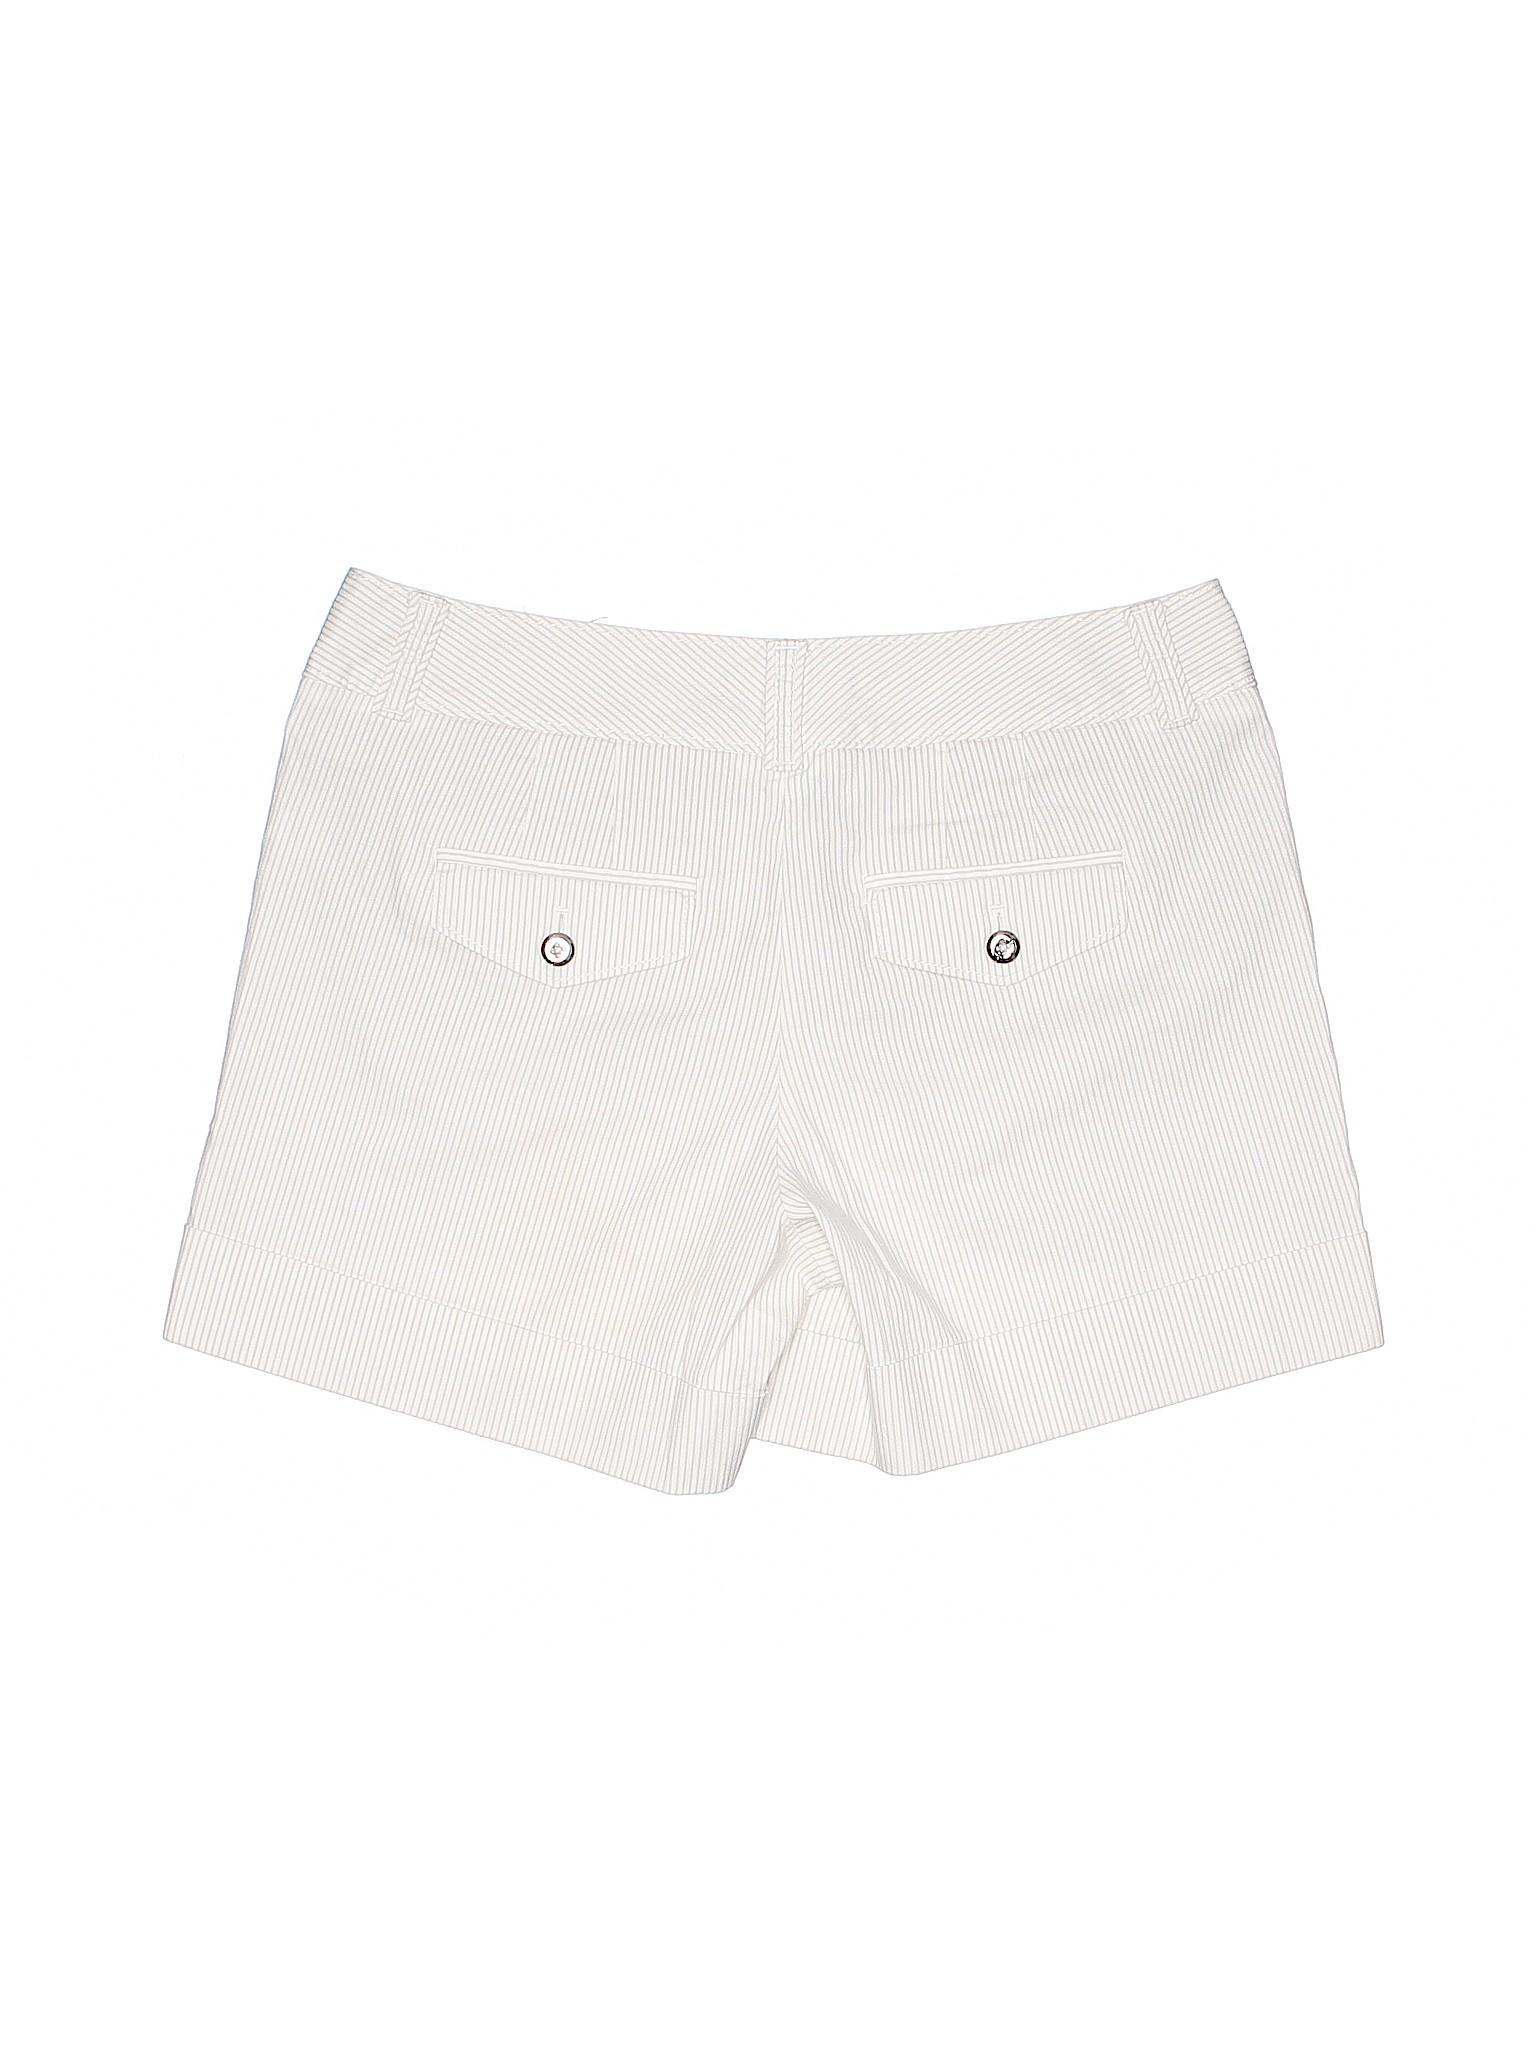 Shorts Black Boutique White Market House qXwpxIU1n